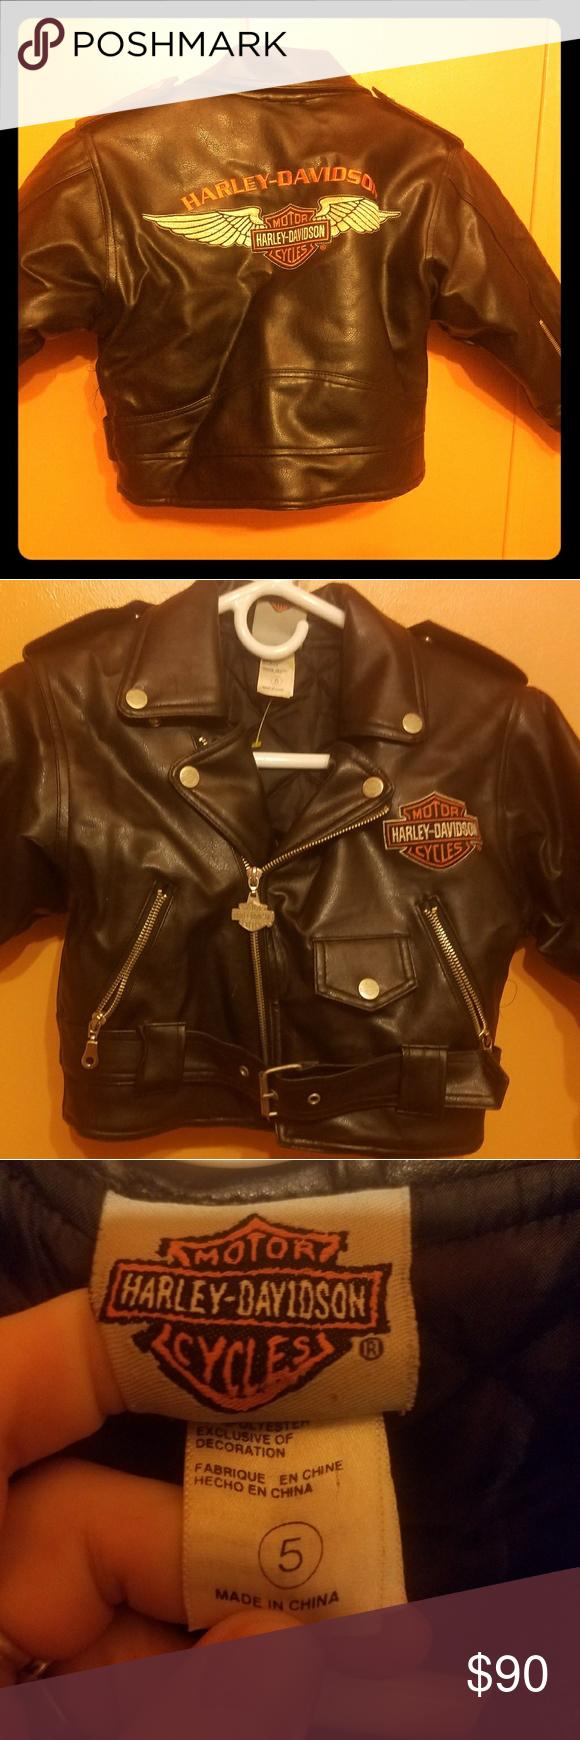 Kid S Leather Harley Davidson Leather Jacket Harley Davidson Leather Jackets Leather Jacket Black Leather Jacket [ 1740 x 580 Pixel ]